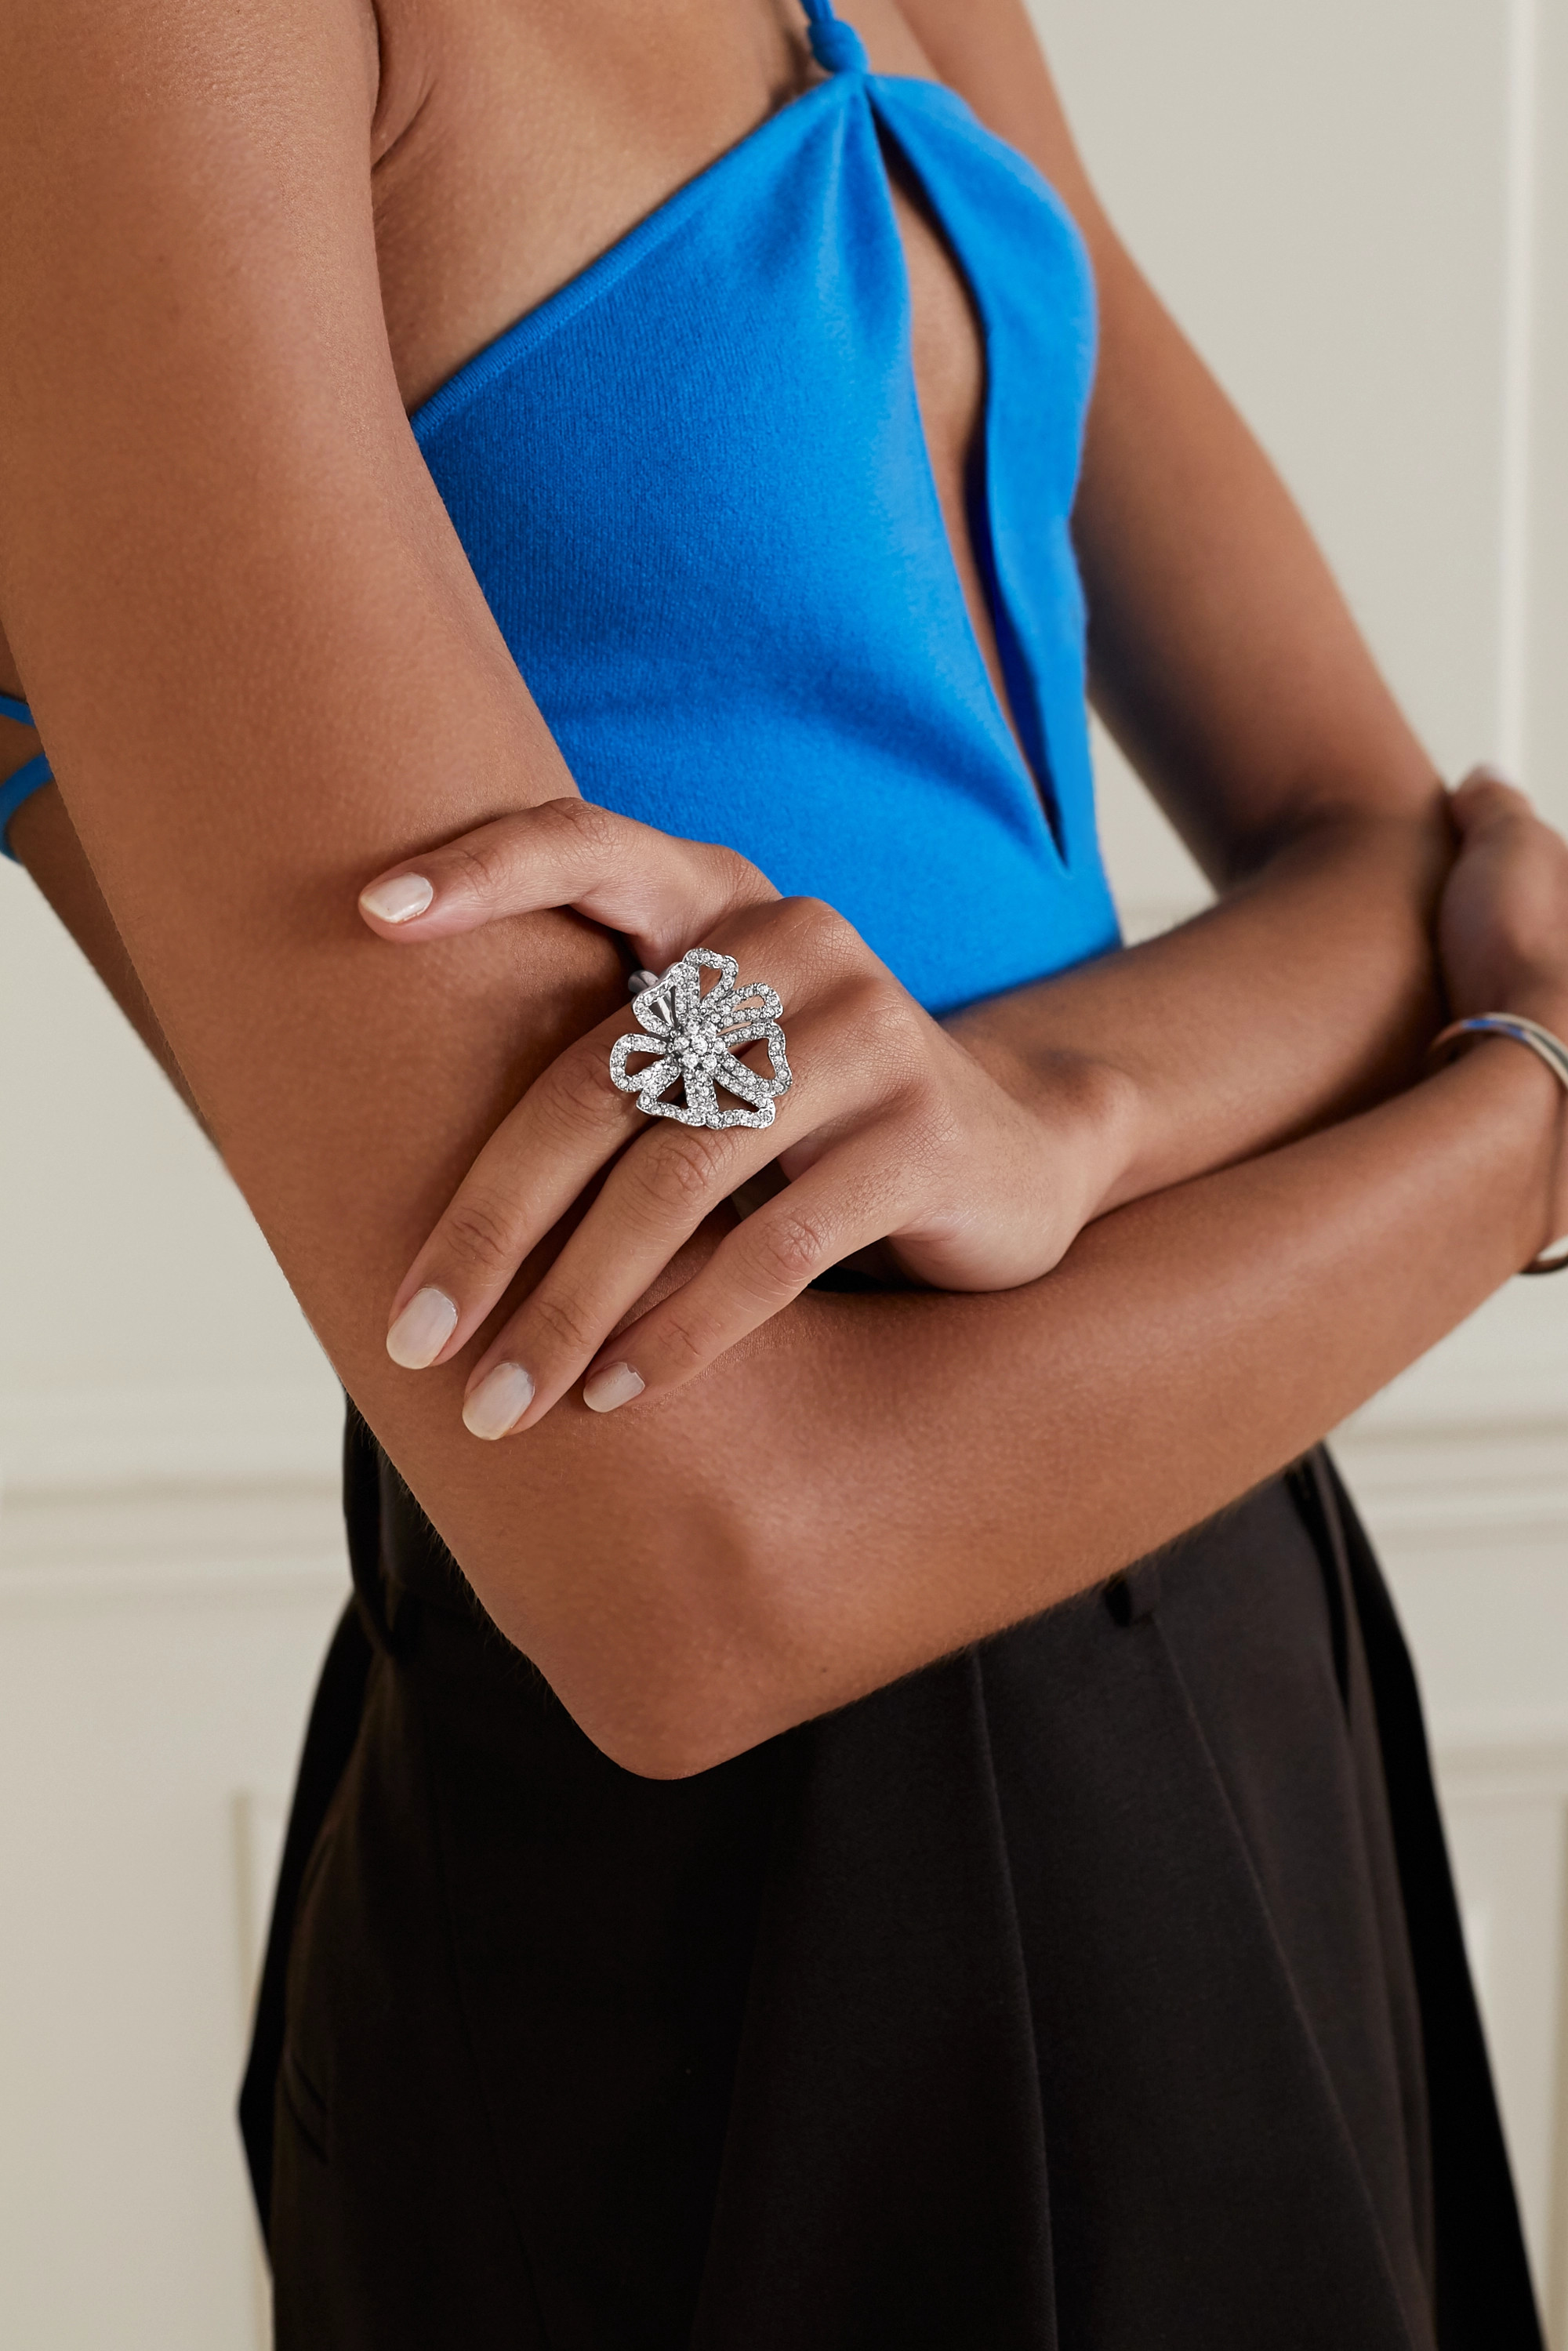 Oscar de la Renta Silberfarbener Ring mit Kristallen